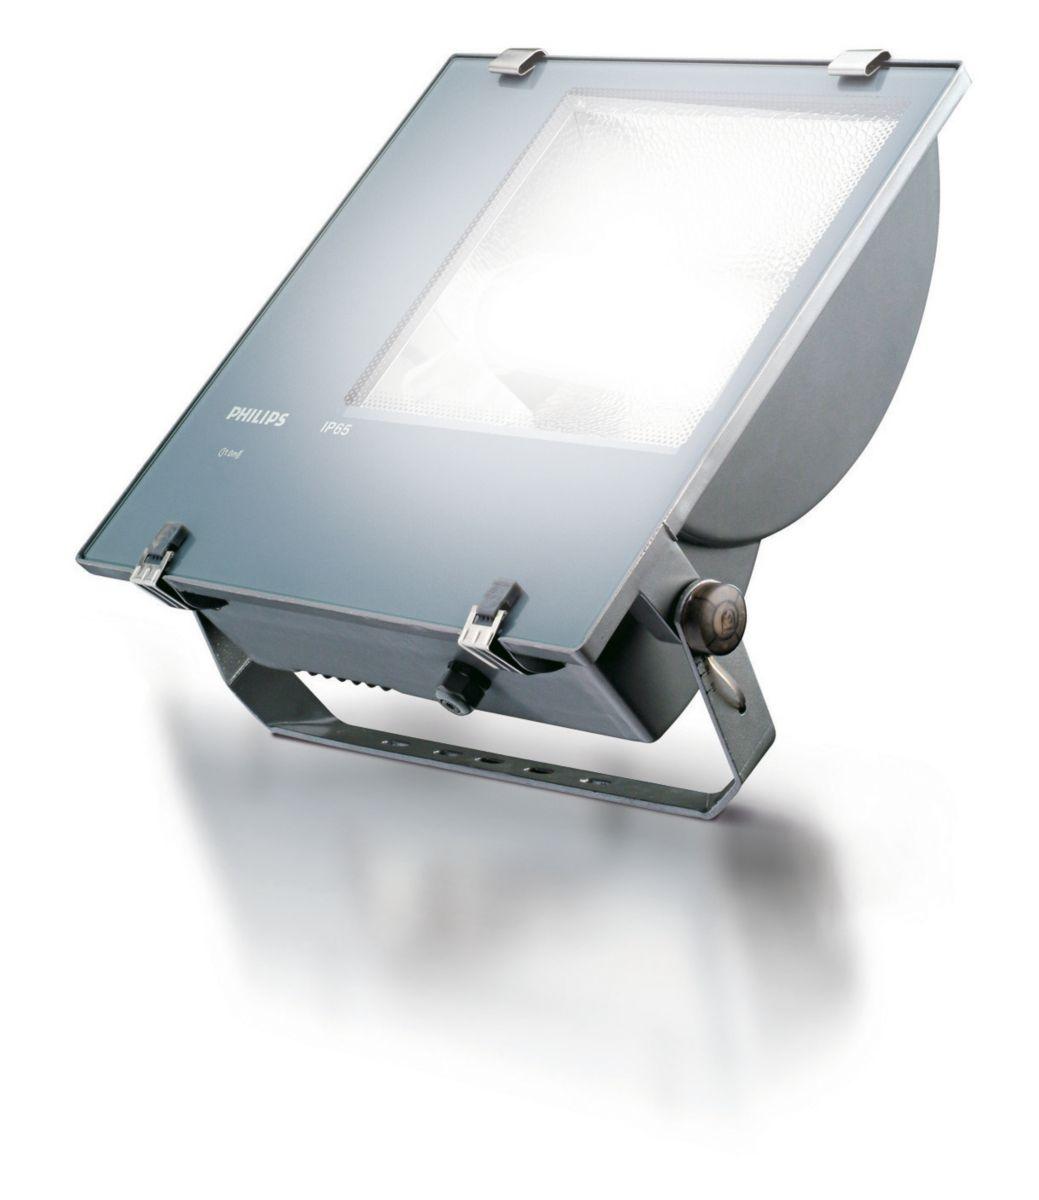 sc 1 st  Philips Lighting & Tempo 3 RVP351 Tempo - Philips Lighting azcodes.com